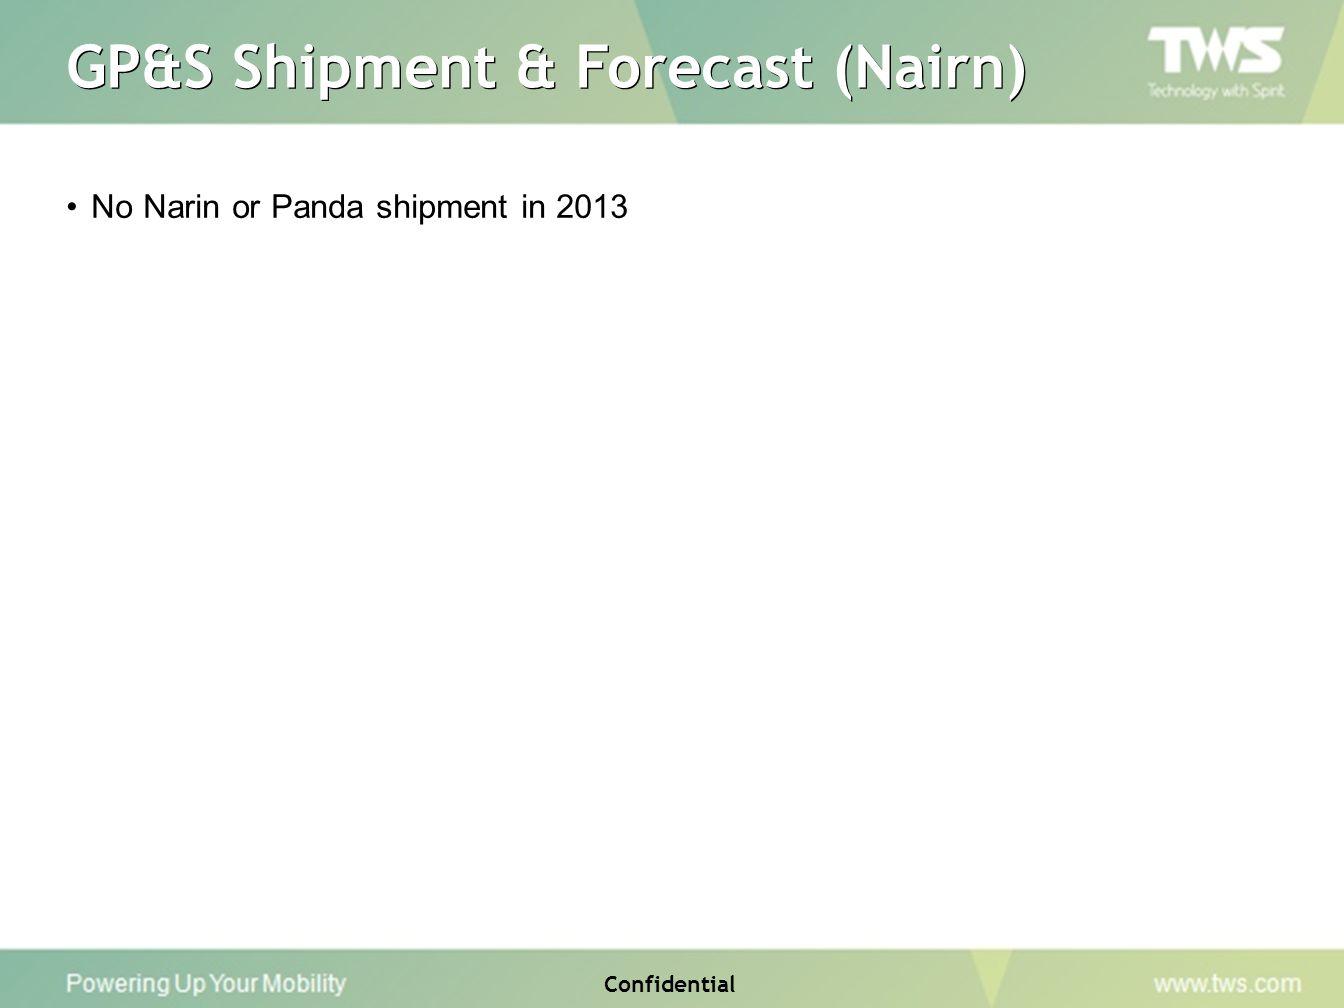 GP&S Shipment & Forecast (Nairn)